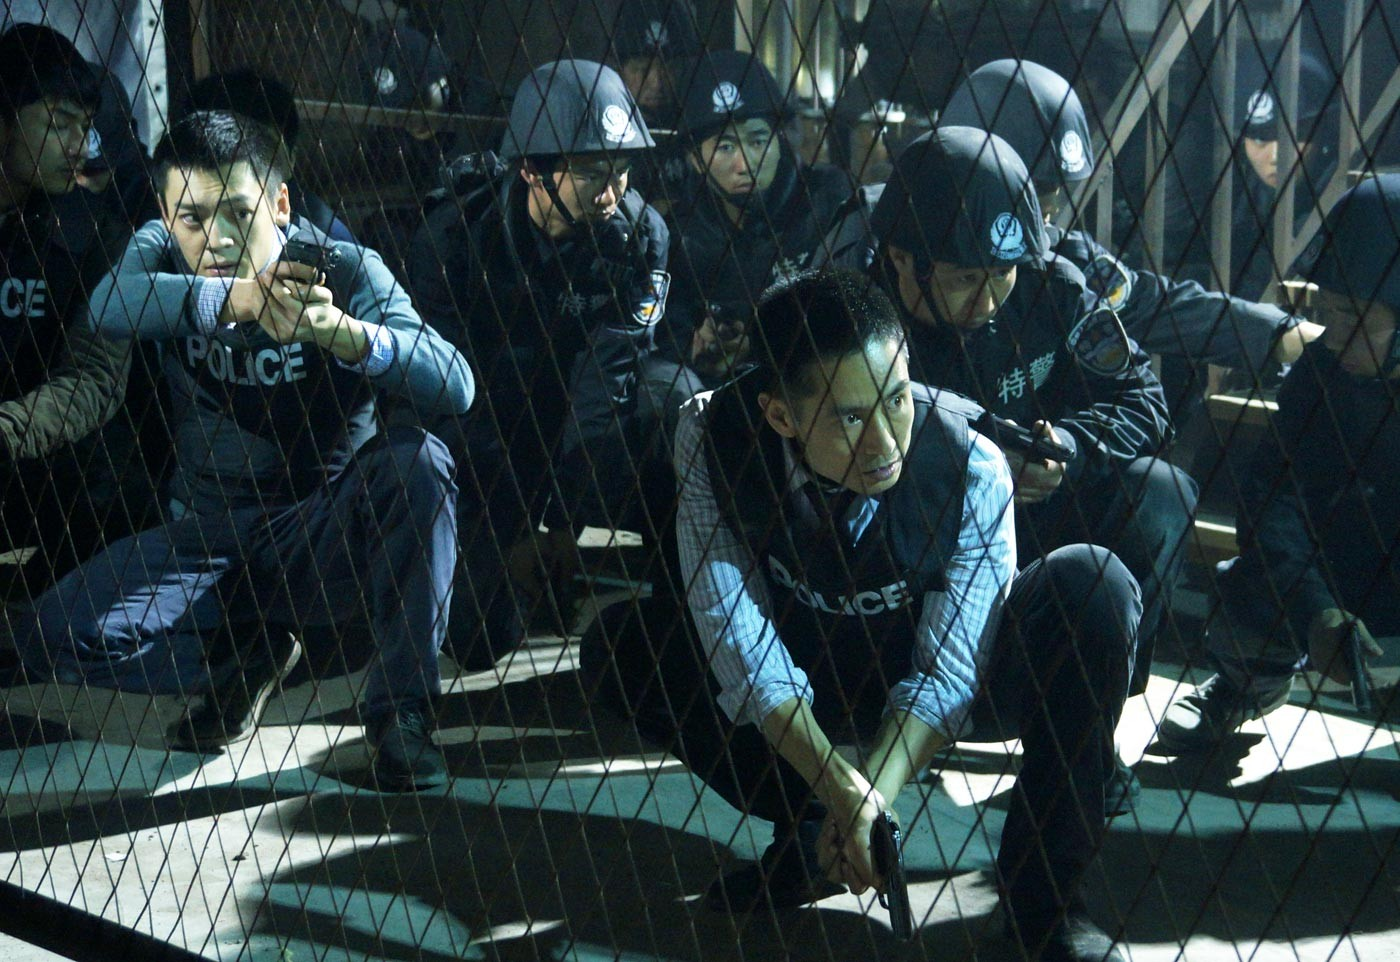 Sun Honglei as Police Captain Zhang in  Drug War